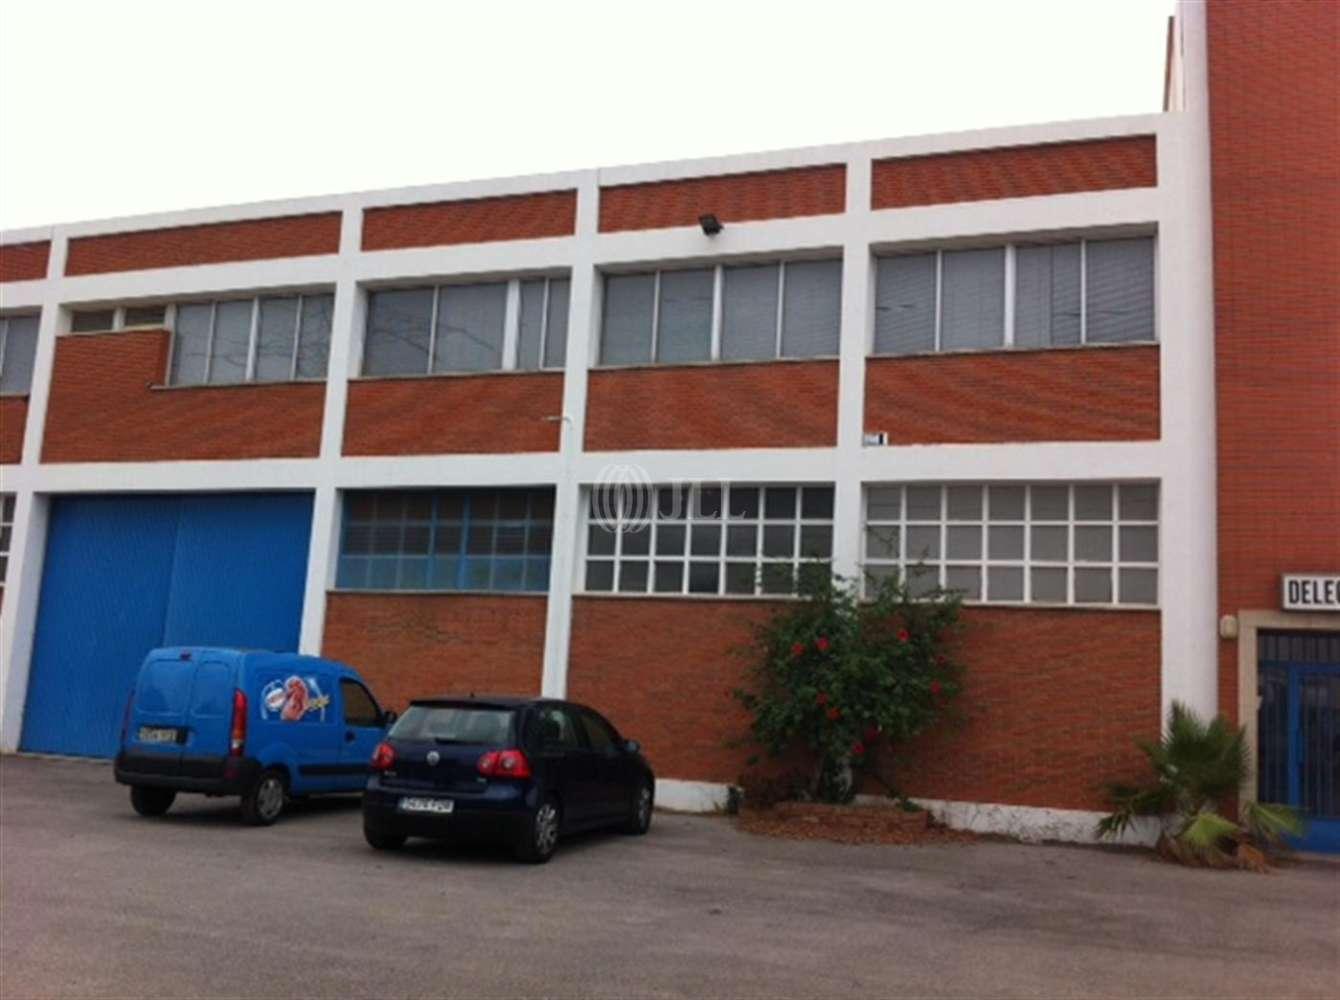 Naves industriales y logísticas Castelló de la plana, 12005 - Nave Industrial - B0516 NAVE INDUSTRIAL EN VENTA CASTELLON -P.I LA RATLLA I ESTEPAR